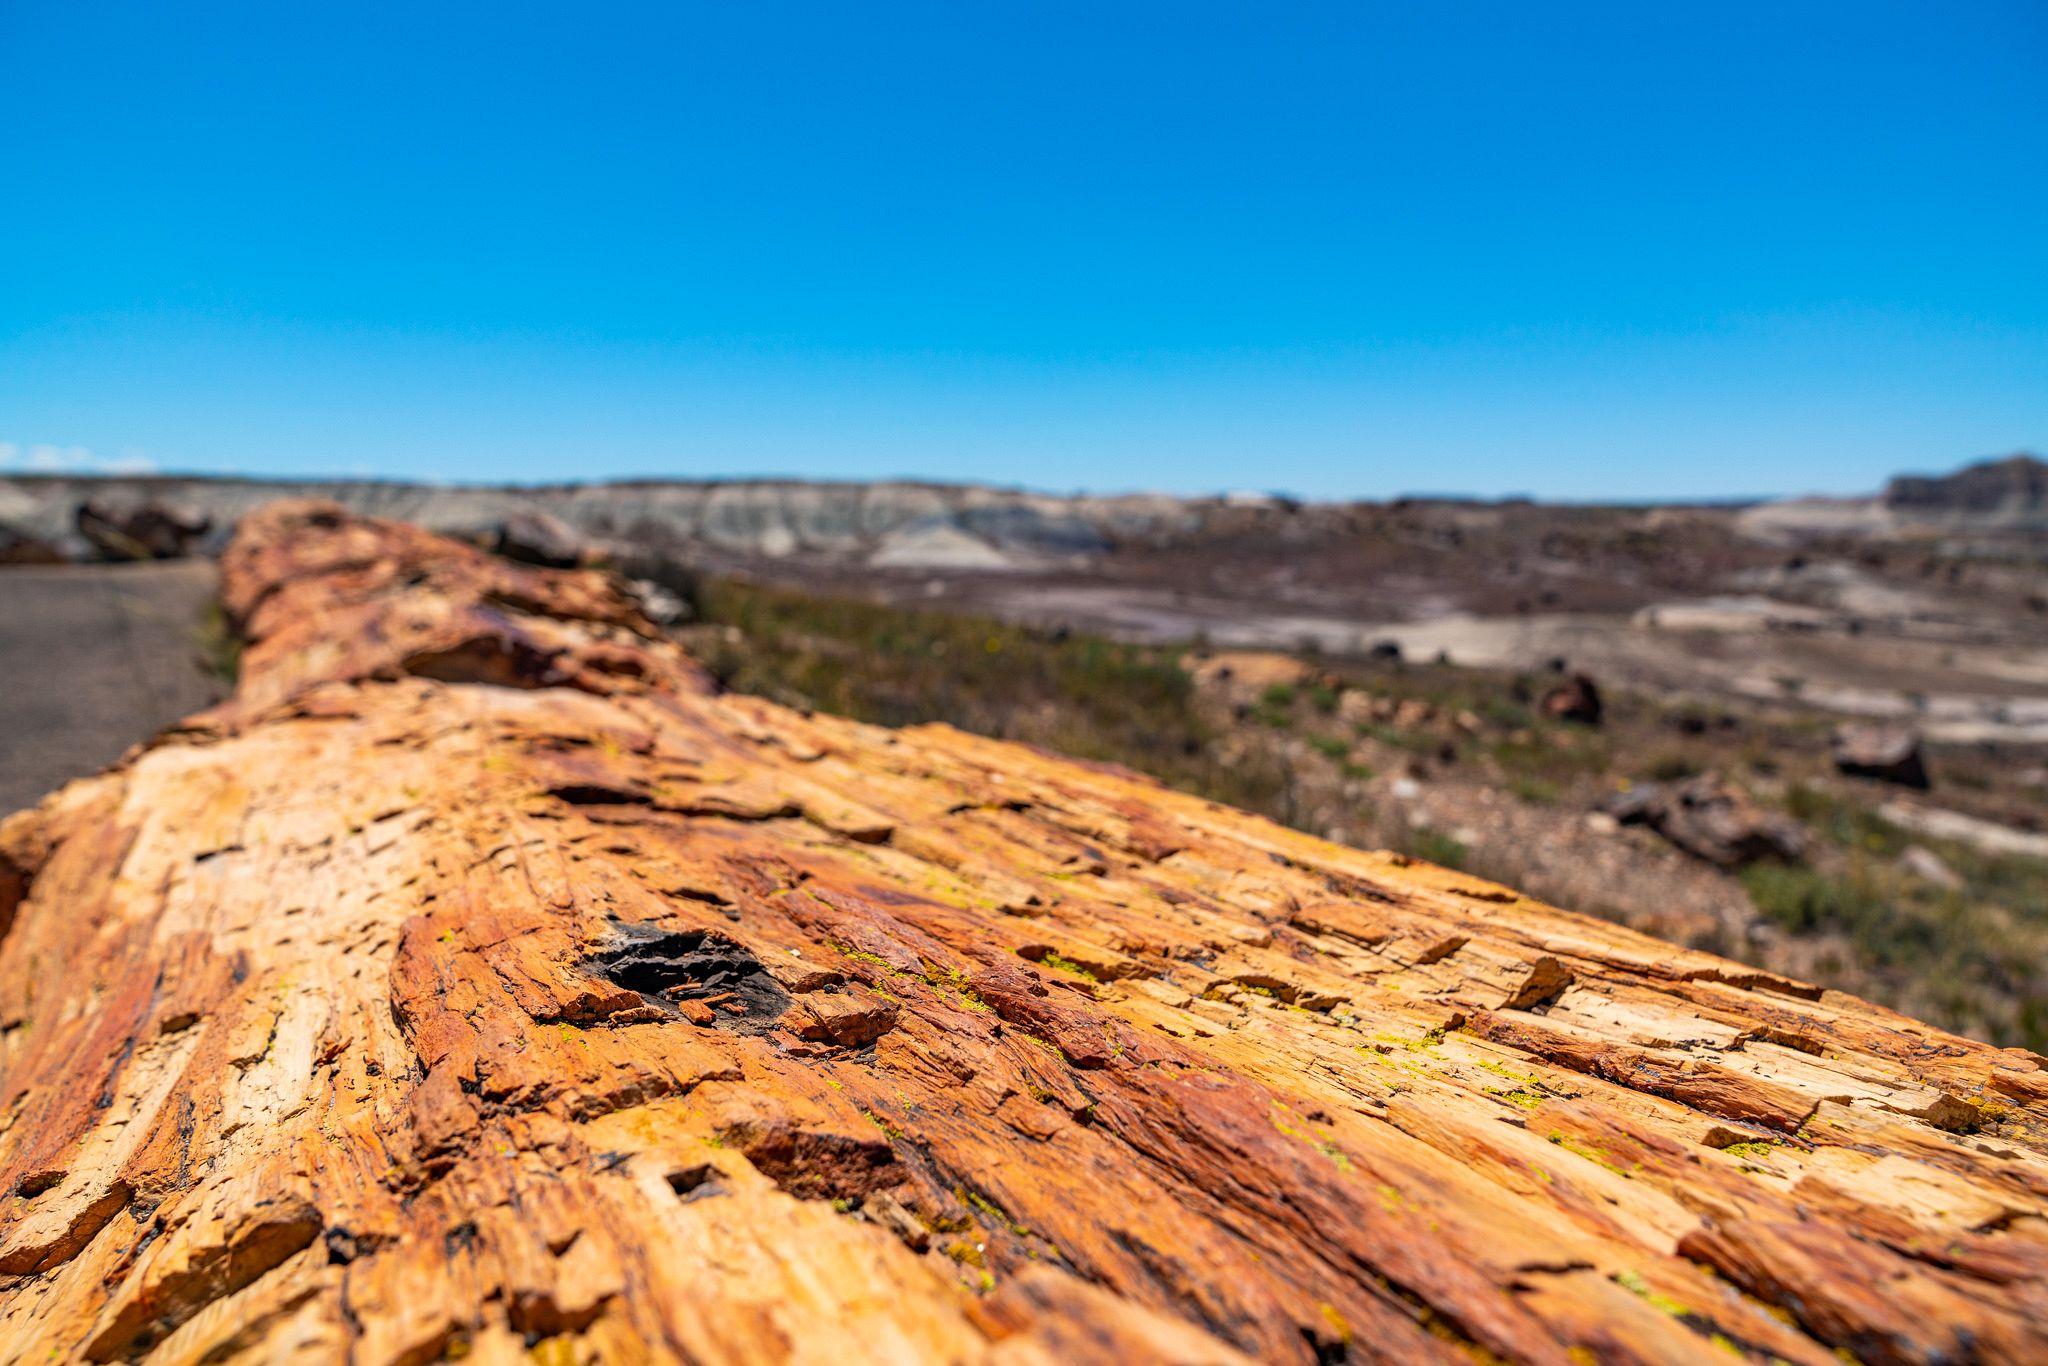 Petrified Wood Bark